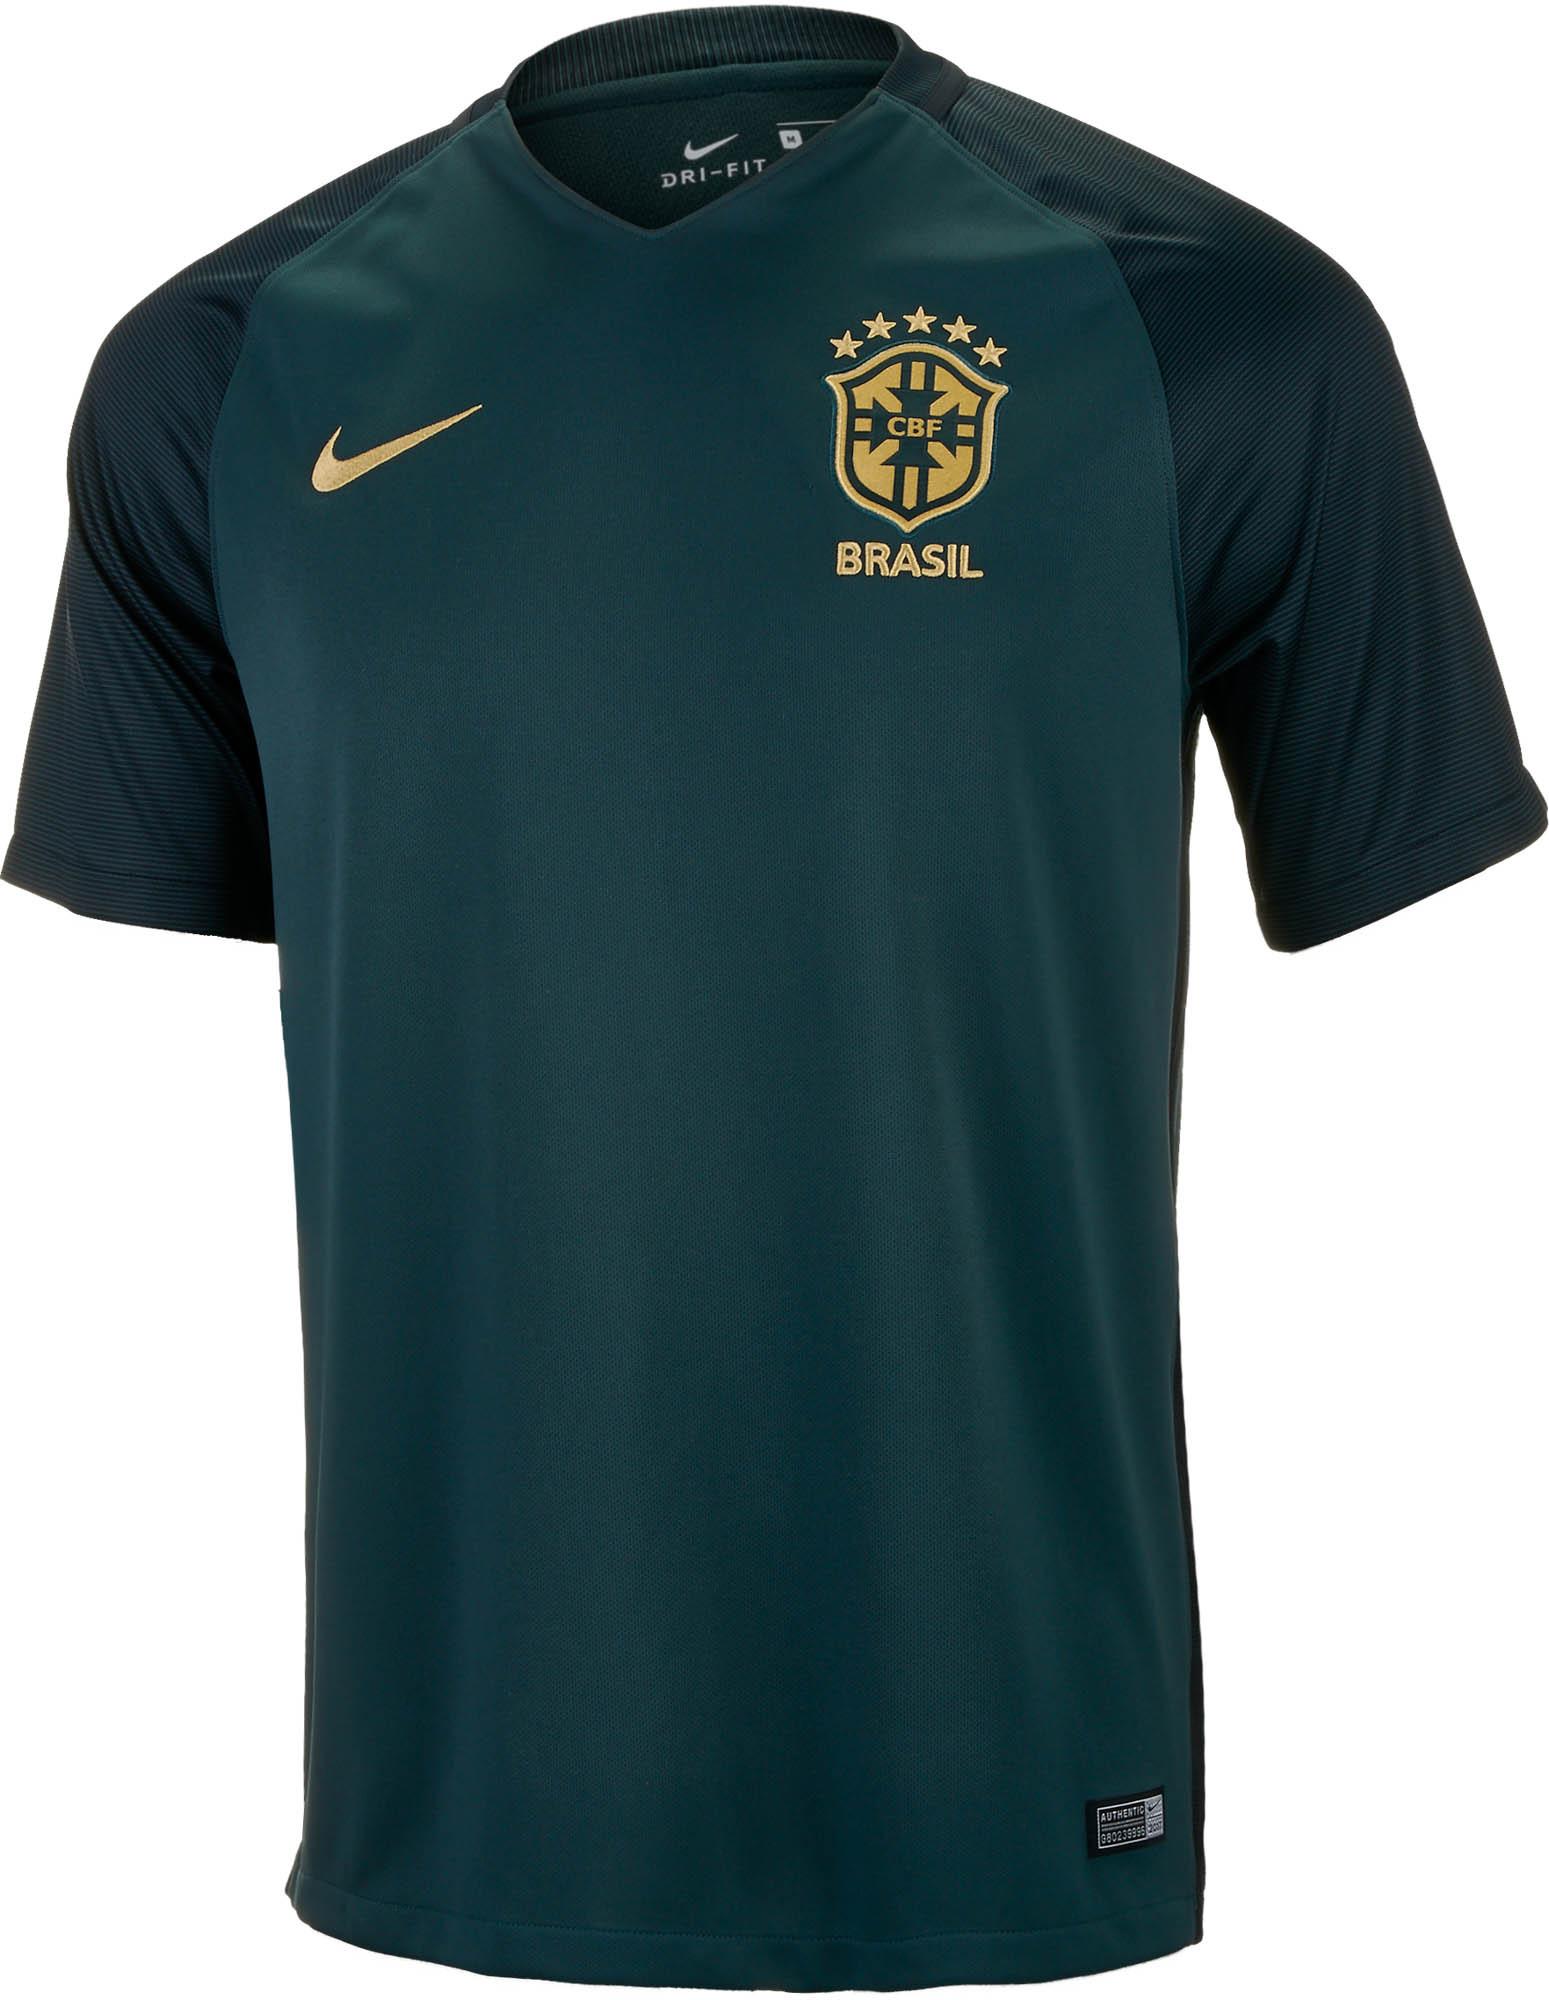 368439aab Nike Brazil 3rd Jersey - 2017 Brazil Soccer Jerseys